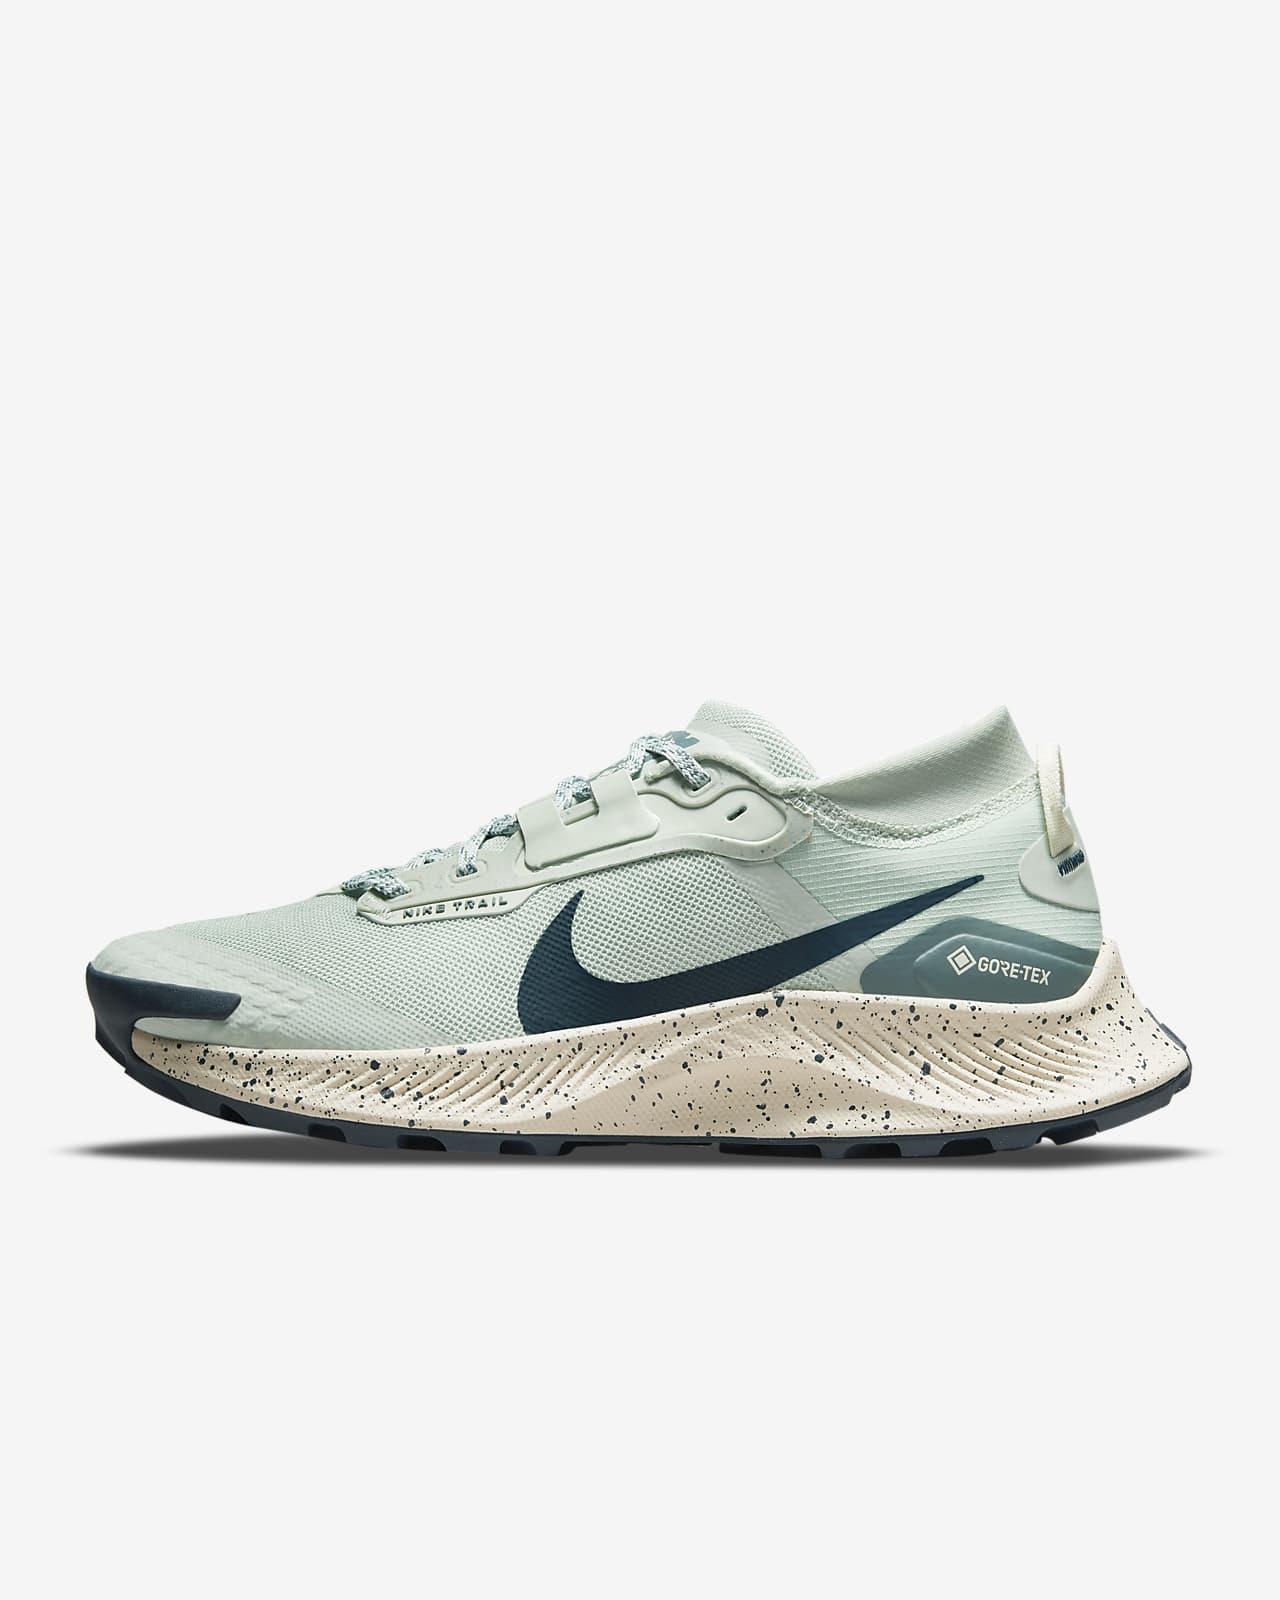 Vandafvisende Nike Pegasus Trail 3 GORE-TEX-trailløbesko til kvinder